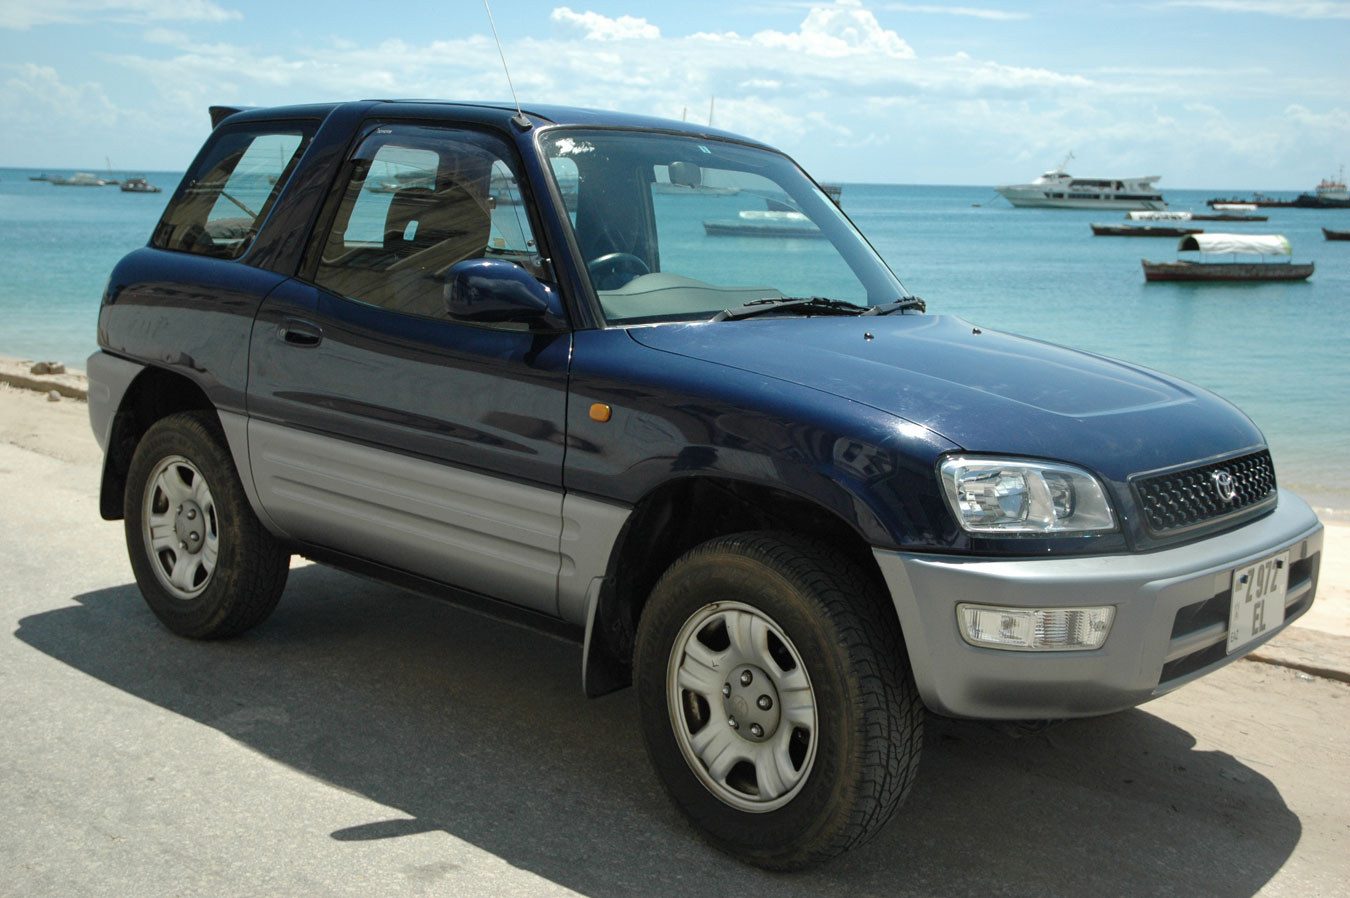 Zanzibar Car Hire Online Booking From 25 Per Day